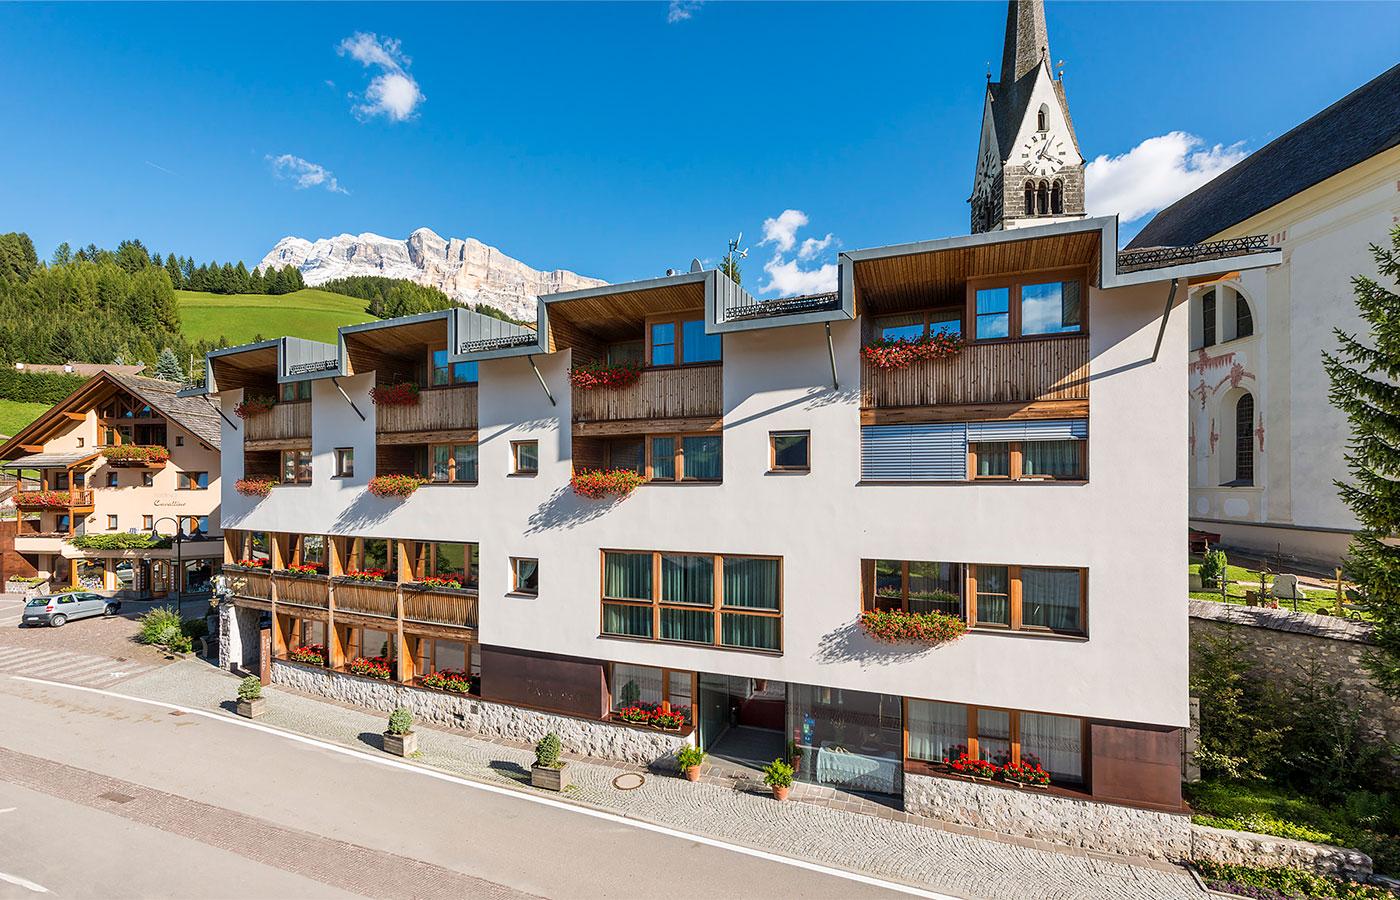 Hotel a san leonardo badia il cavallino - Residence val badia con piscina ...